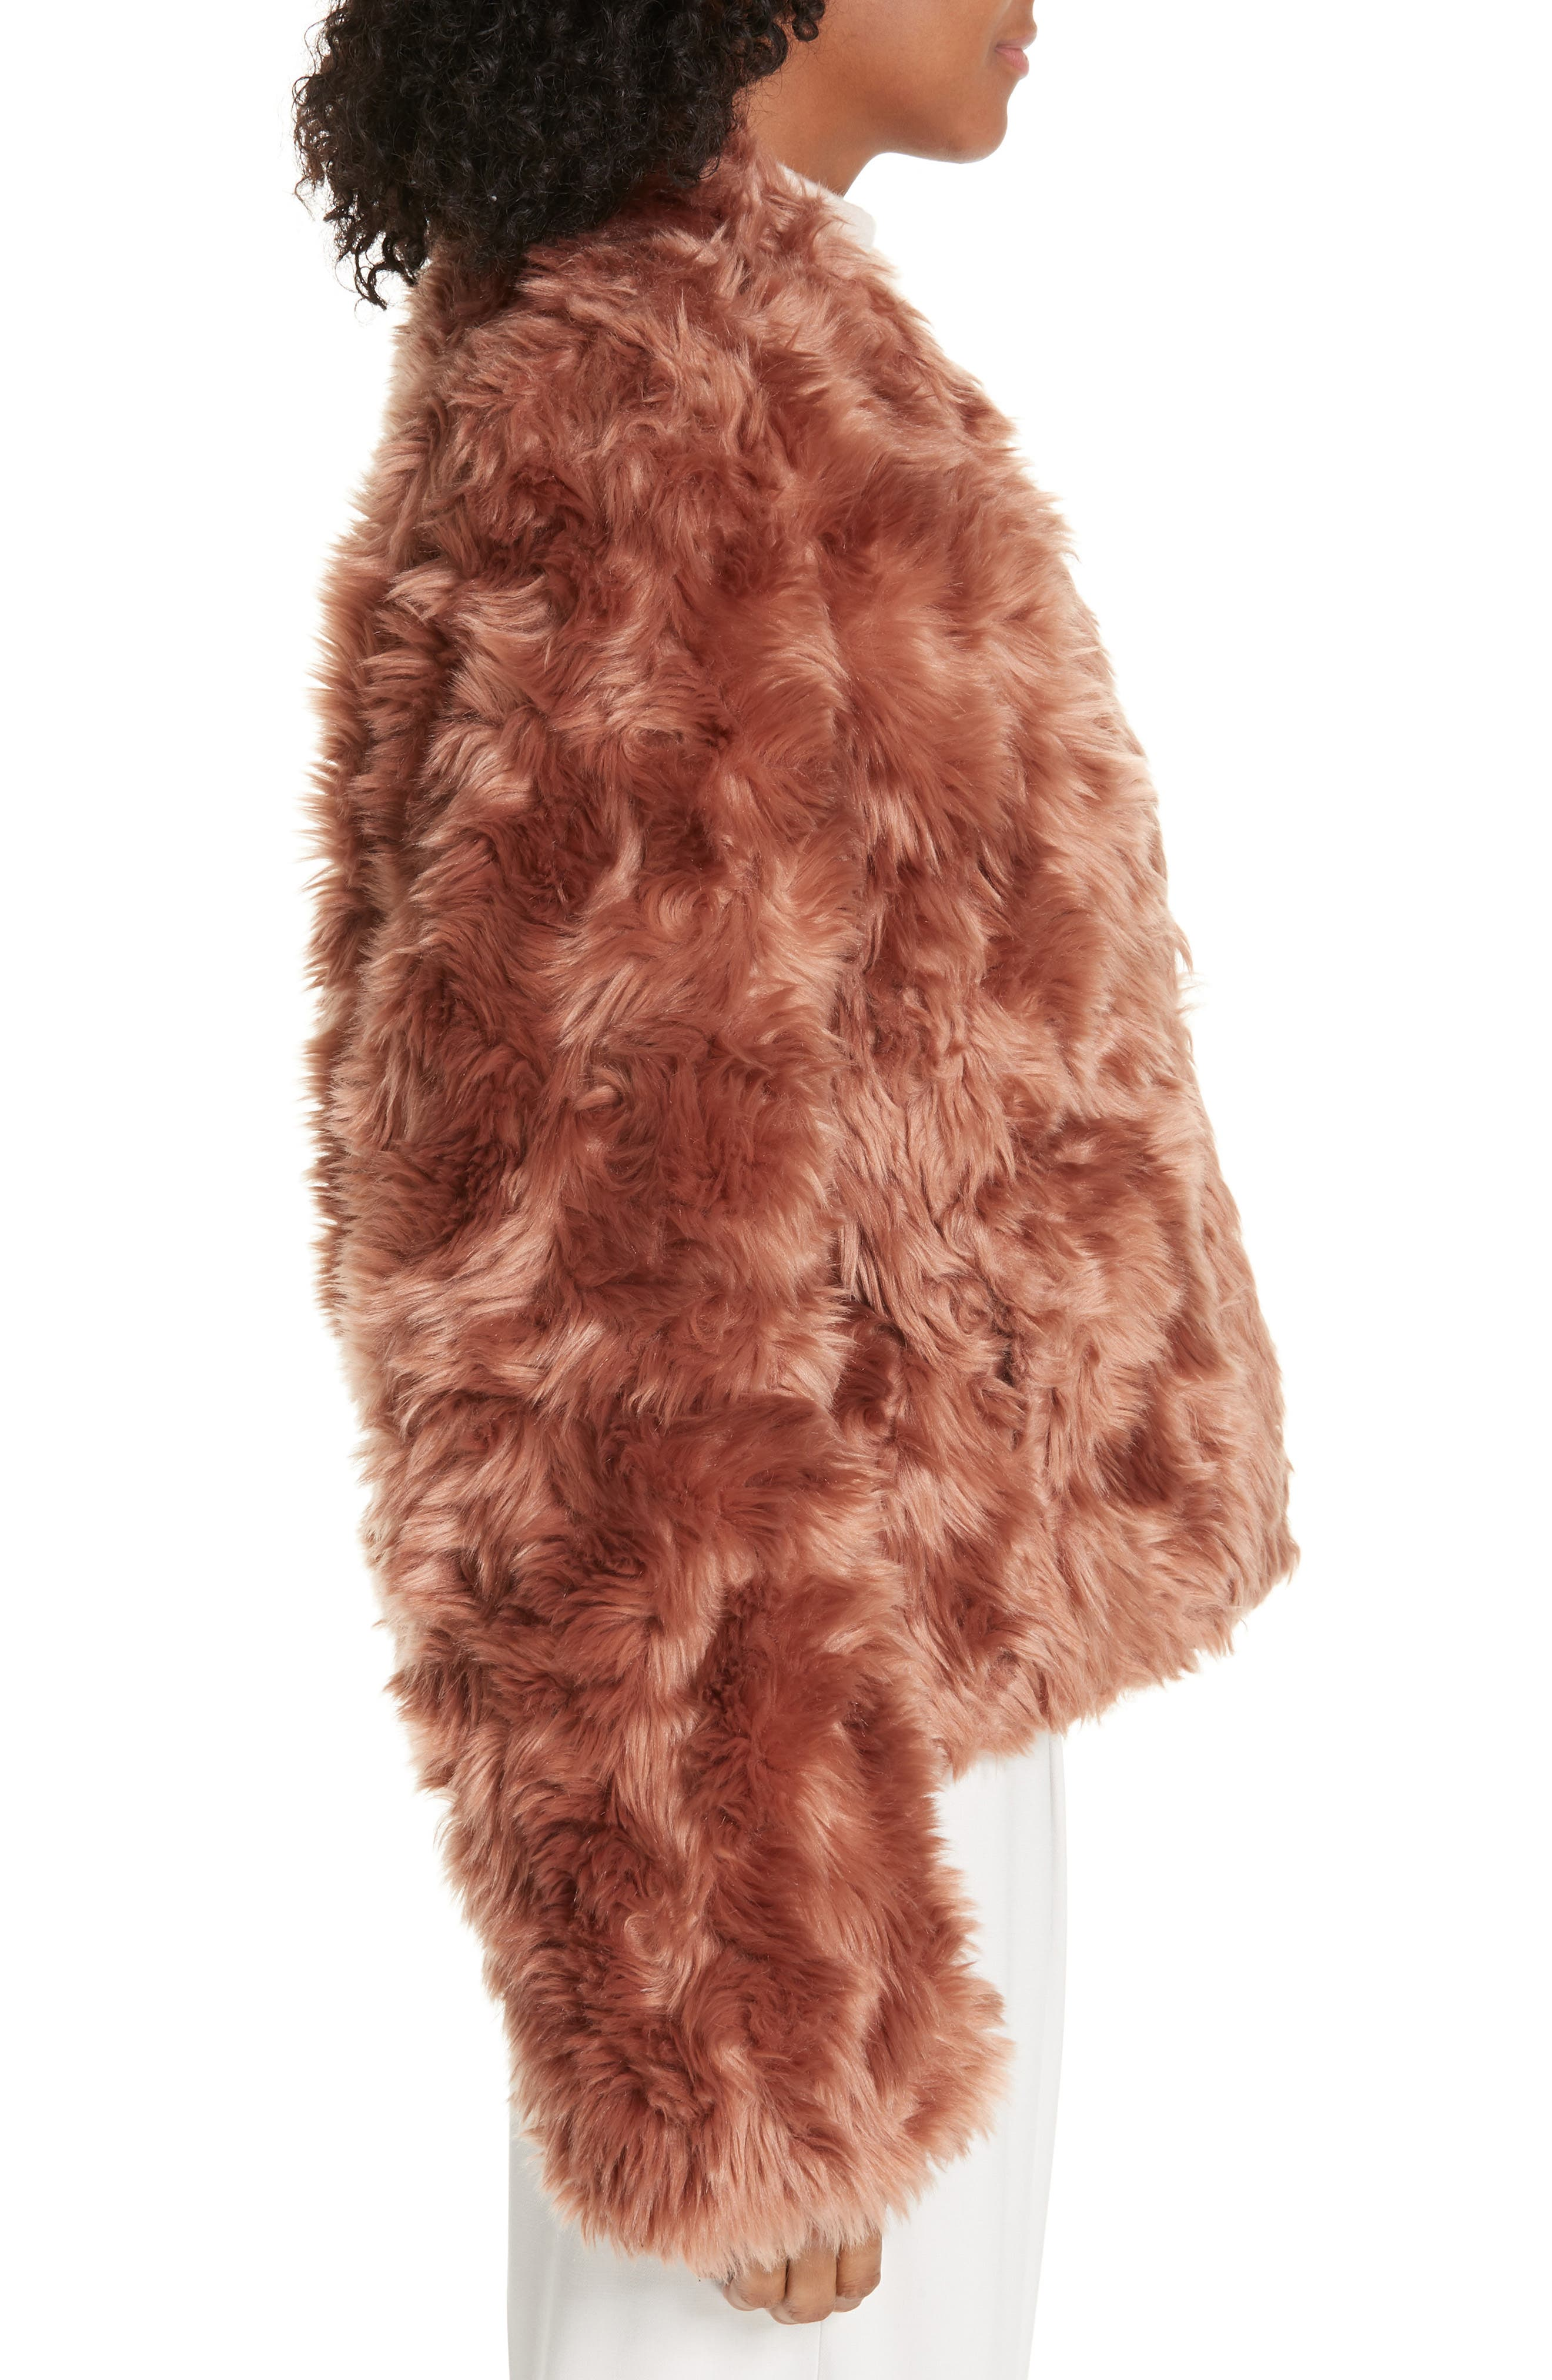 VINCE, Plush Faux Fur Jacket, Alternate thumbnail 4, color, PINK UMBER